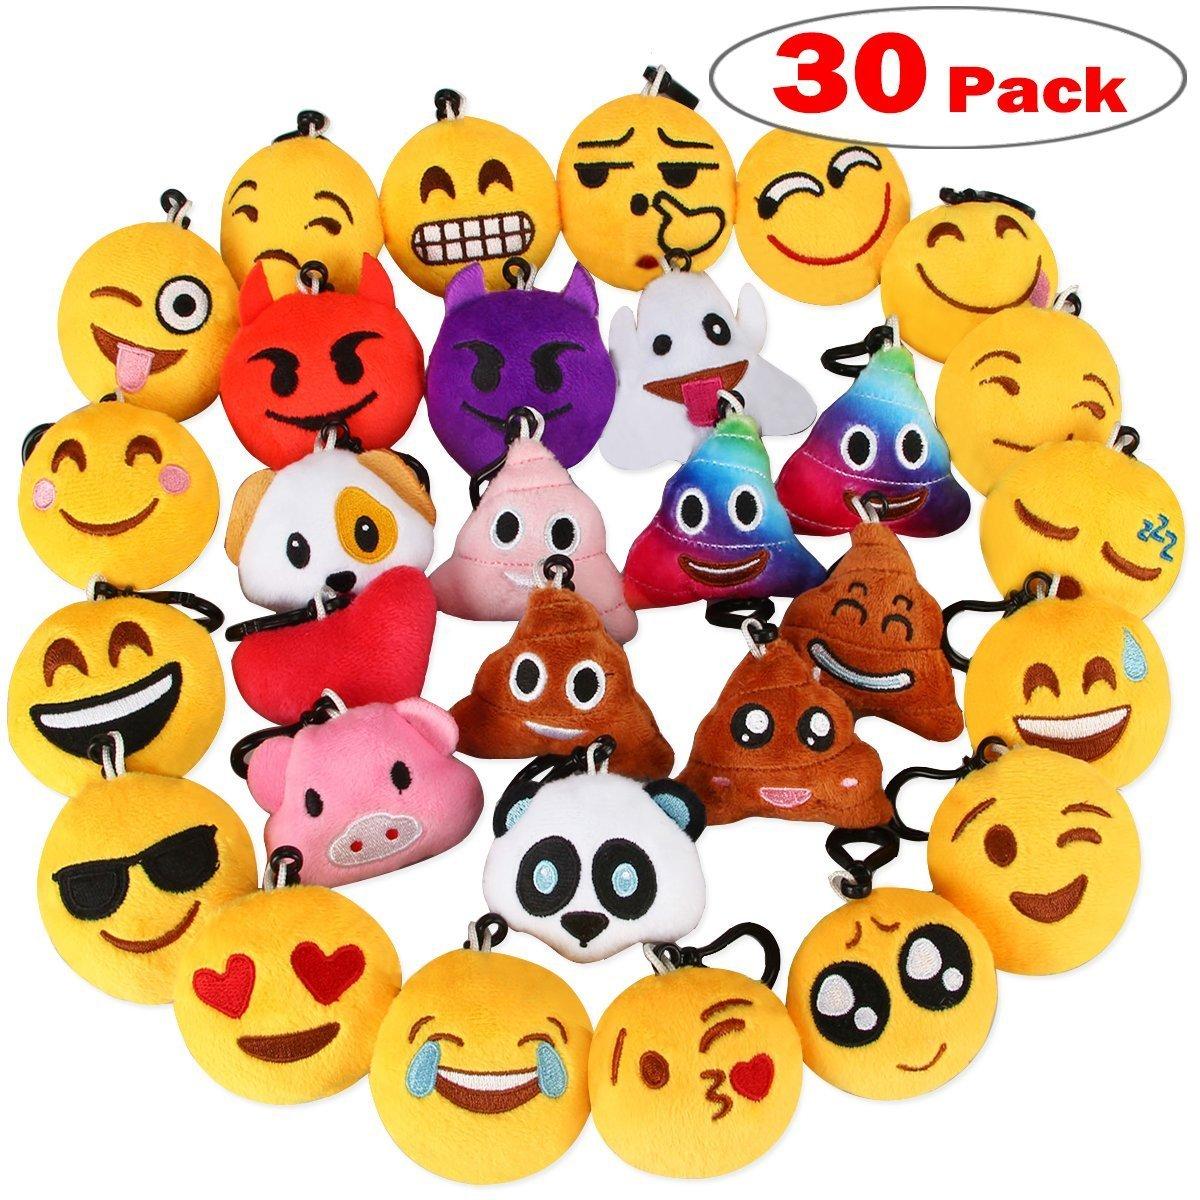 Dreampark Emoji Keychain, Emoji Key Chain Mini Plush Poop Pillows, Party Favors for Kids, Christmas / Birthday Party Supplies 2'' Set of 30